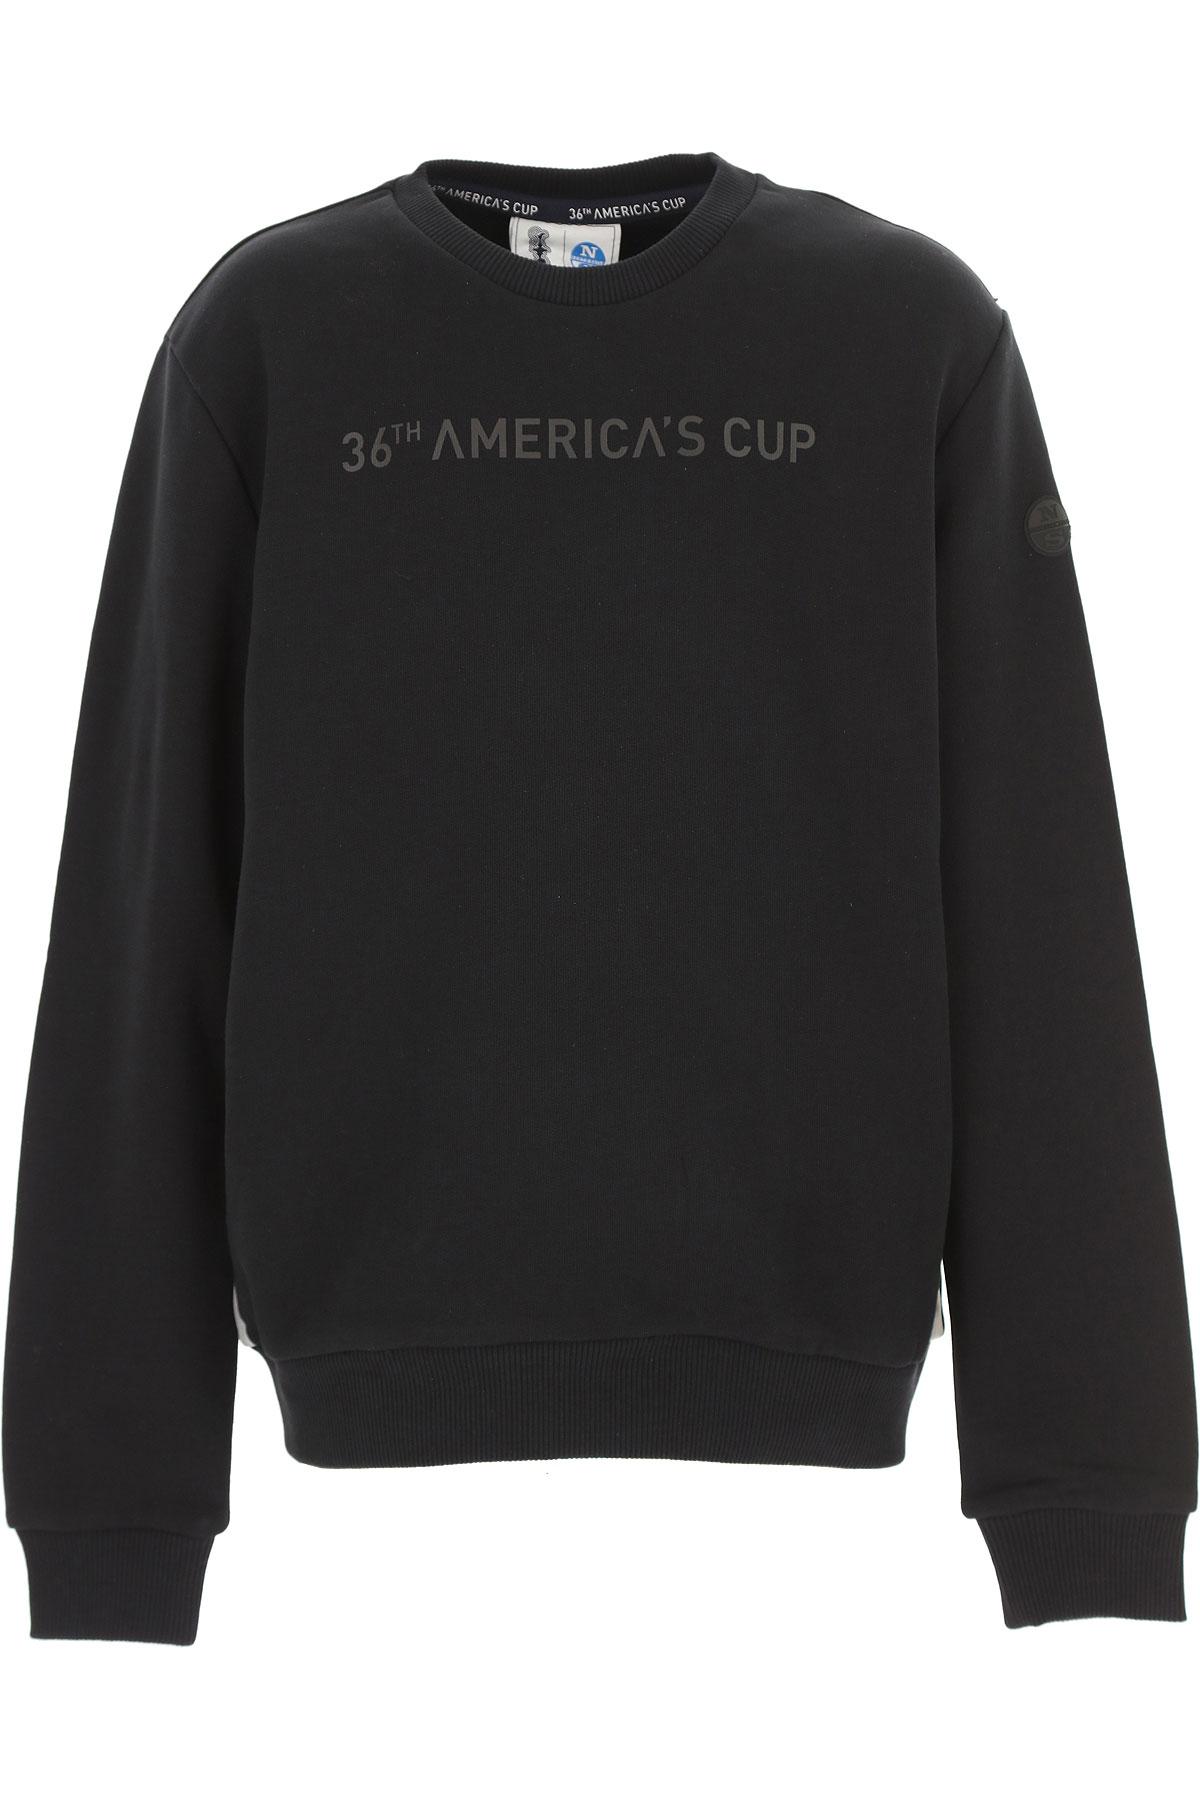 North Sails Kids Sweatshirts & Hoodies for Boys On Sale, Black, Cotton, 2019, 10Y 8Y